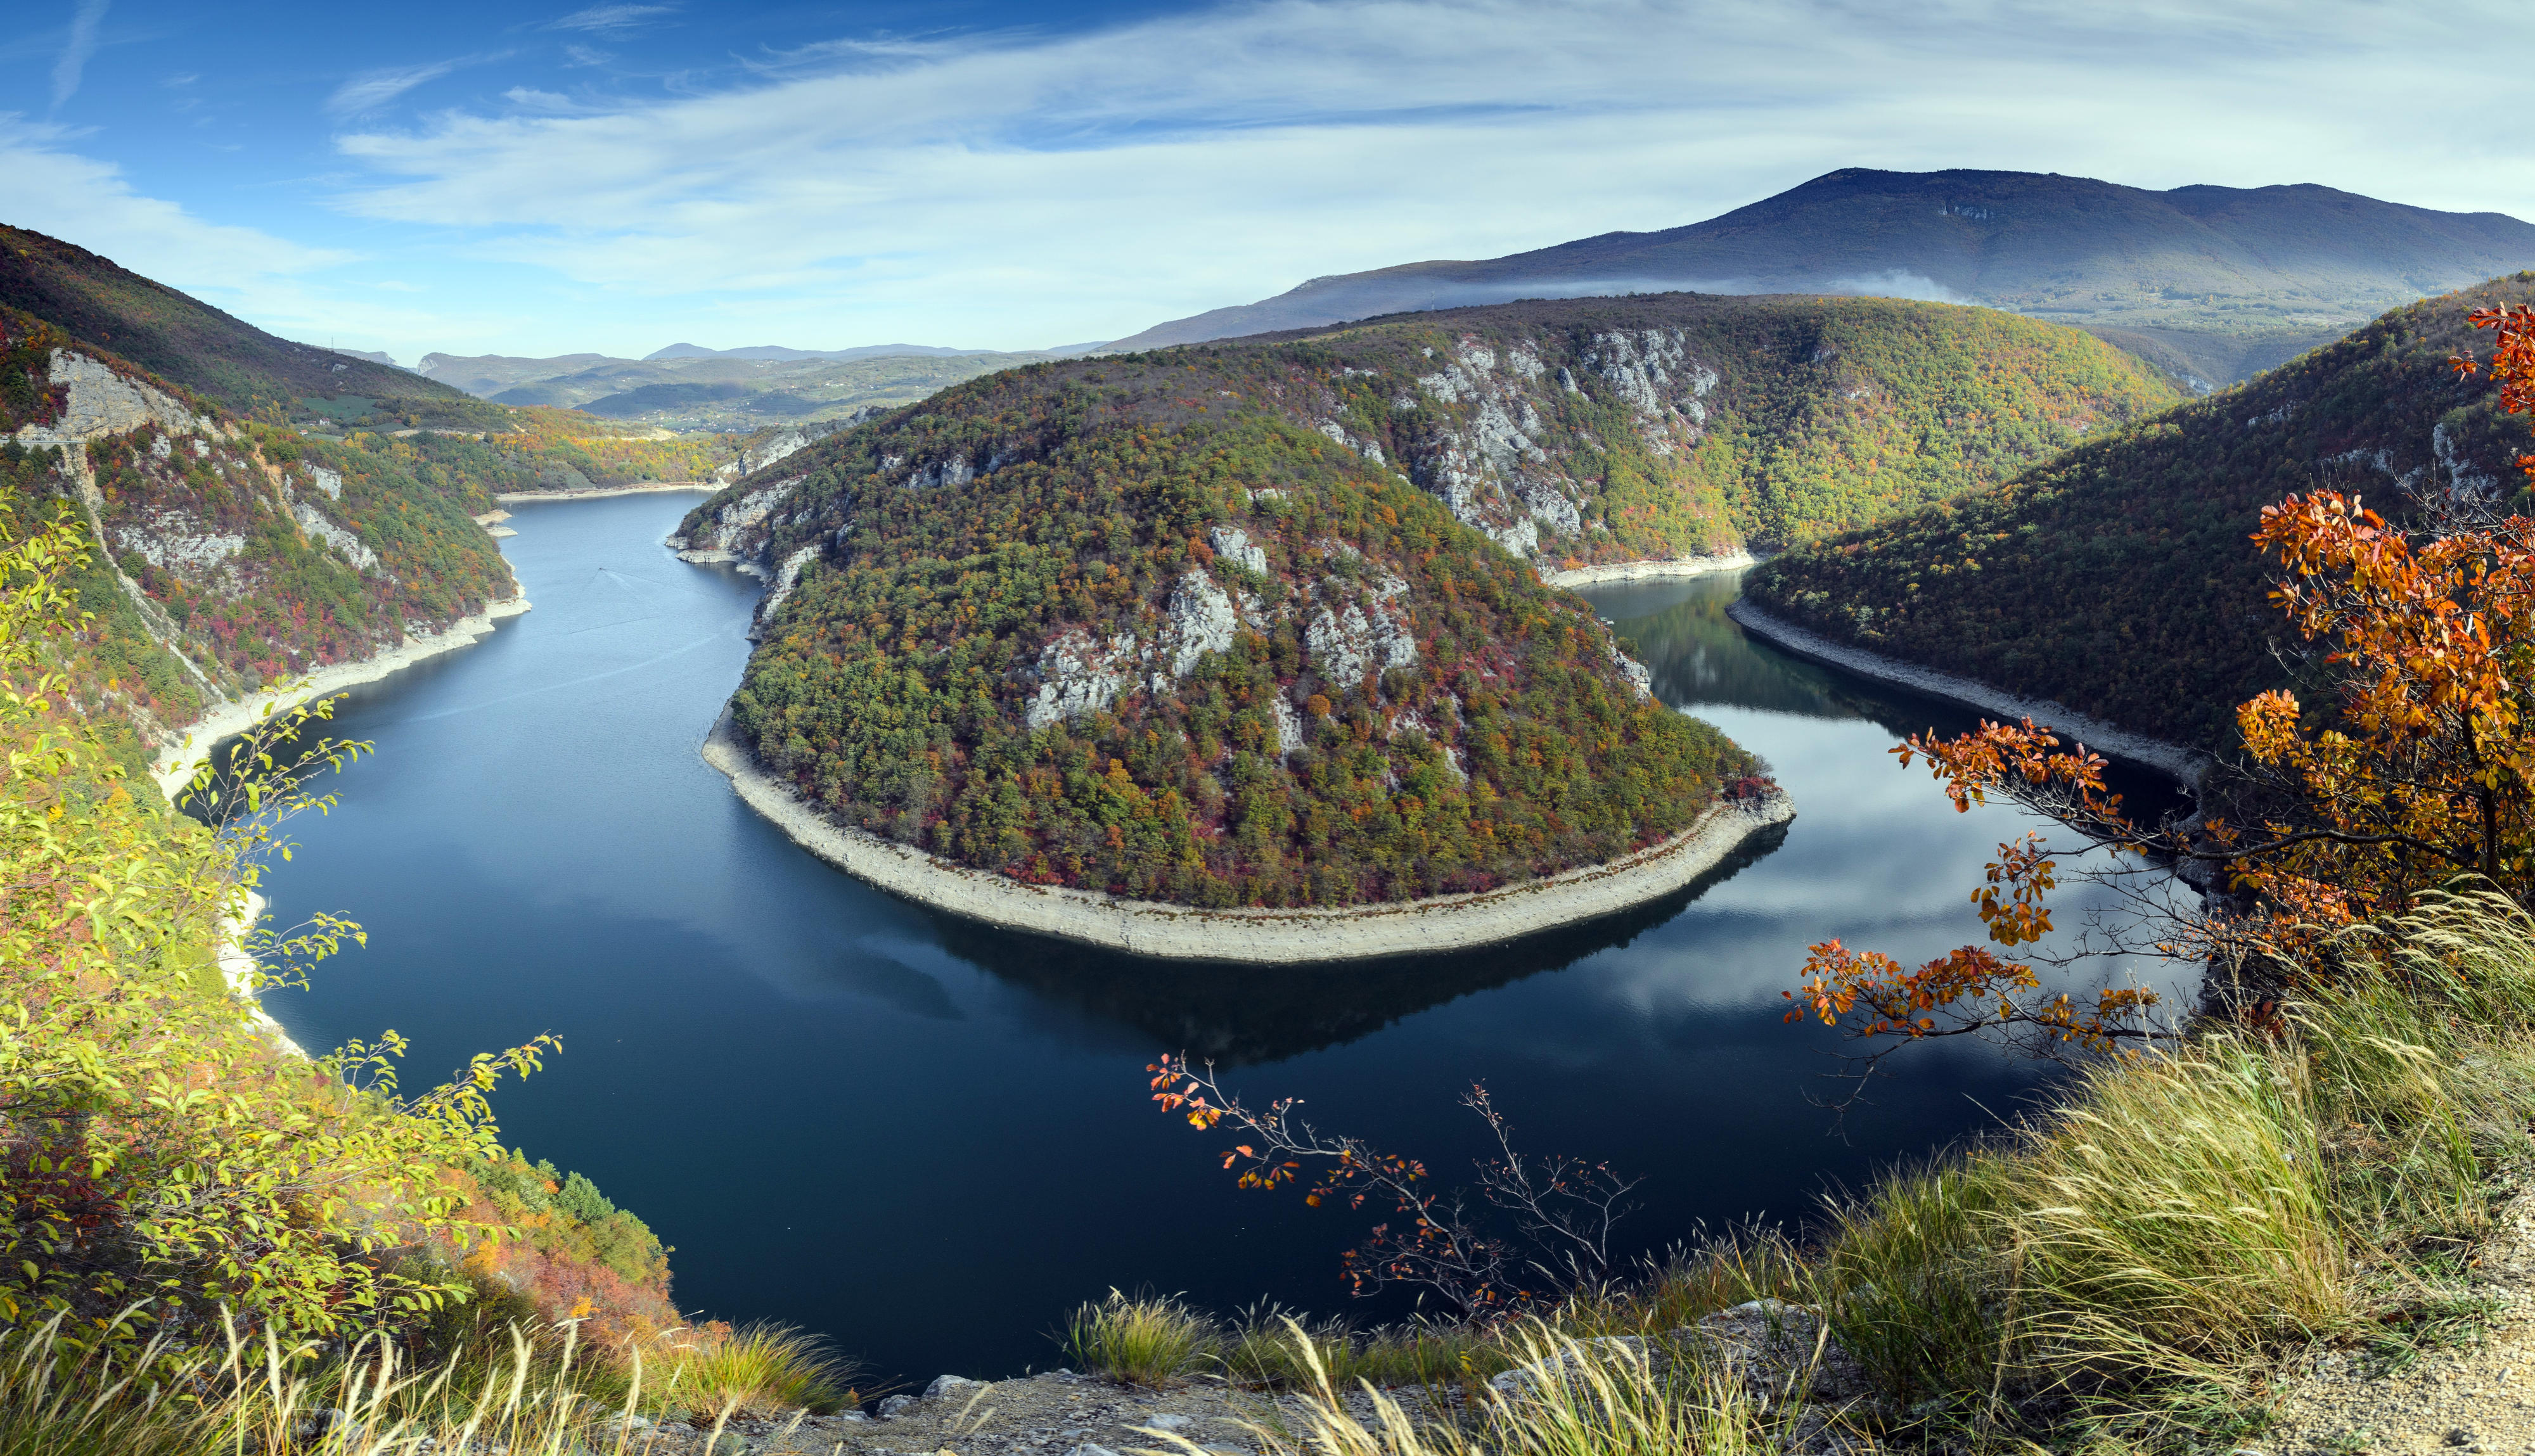 Der Fluss Vrbas